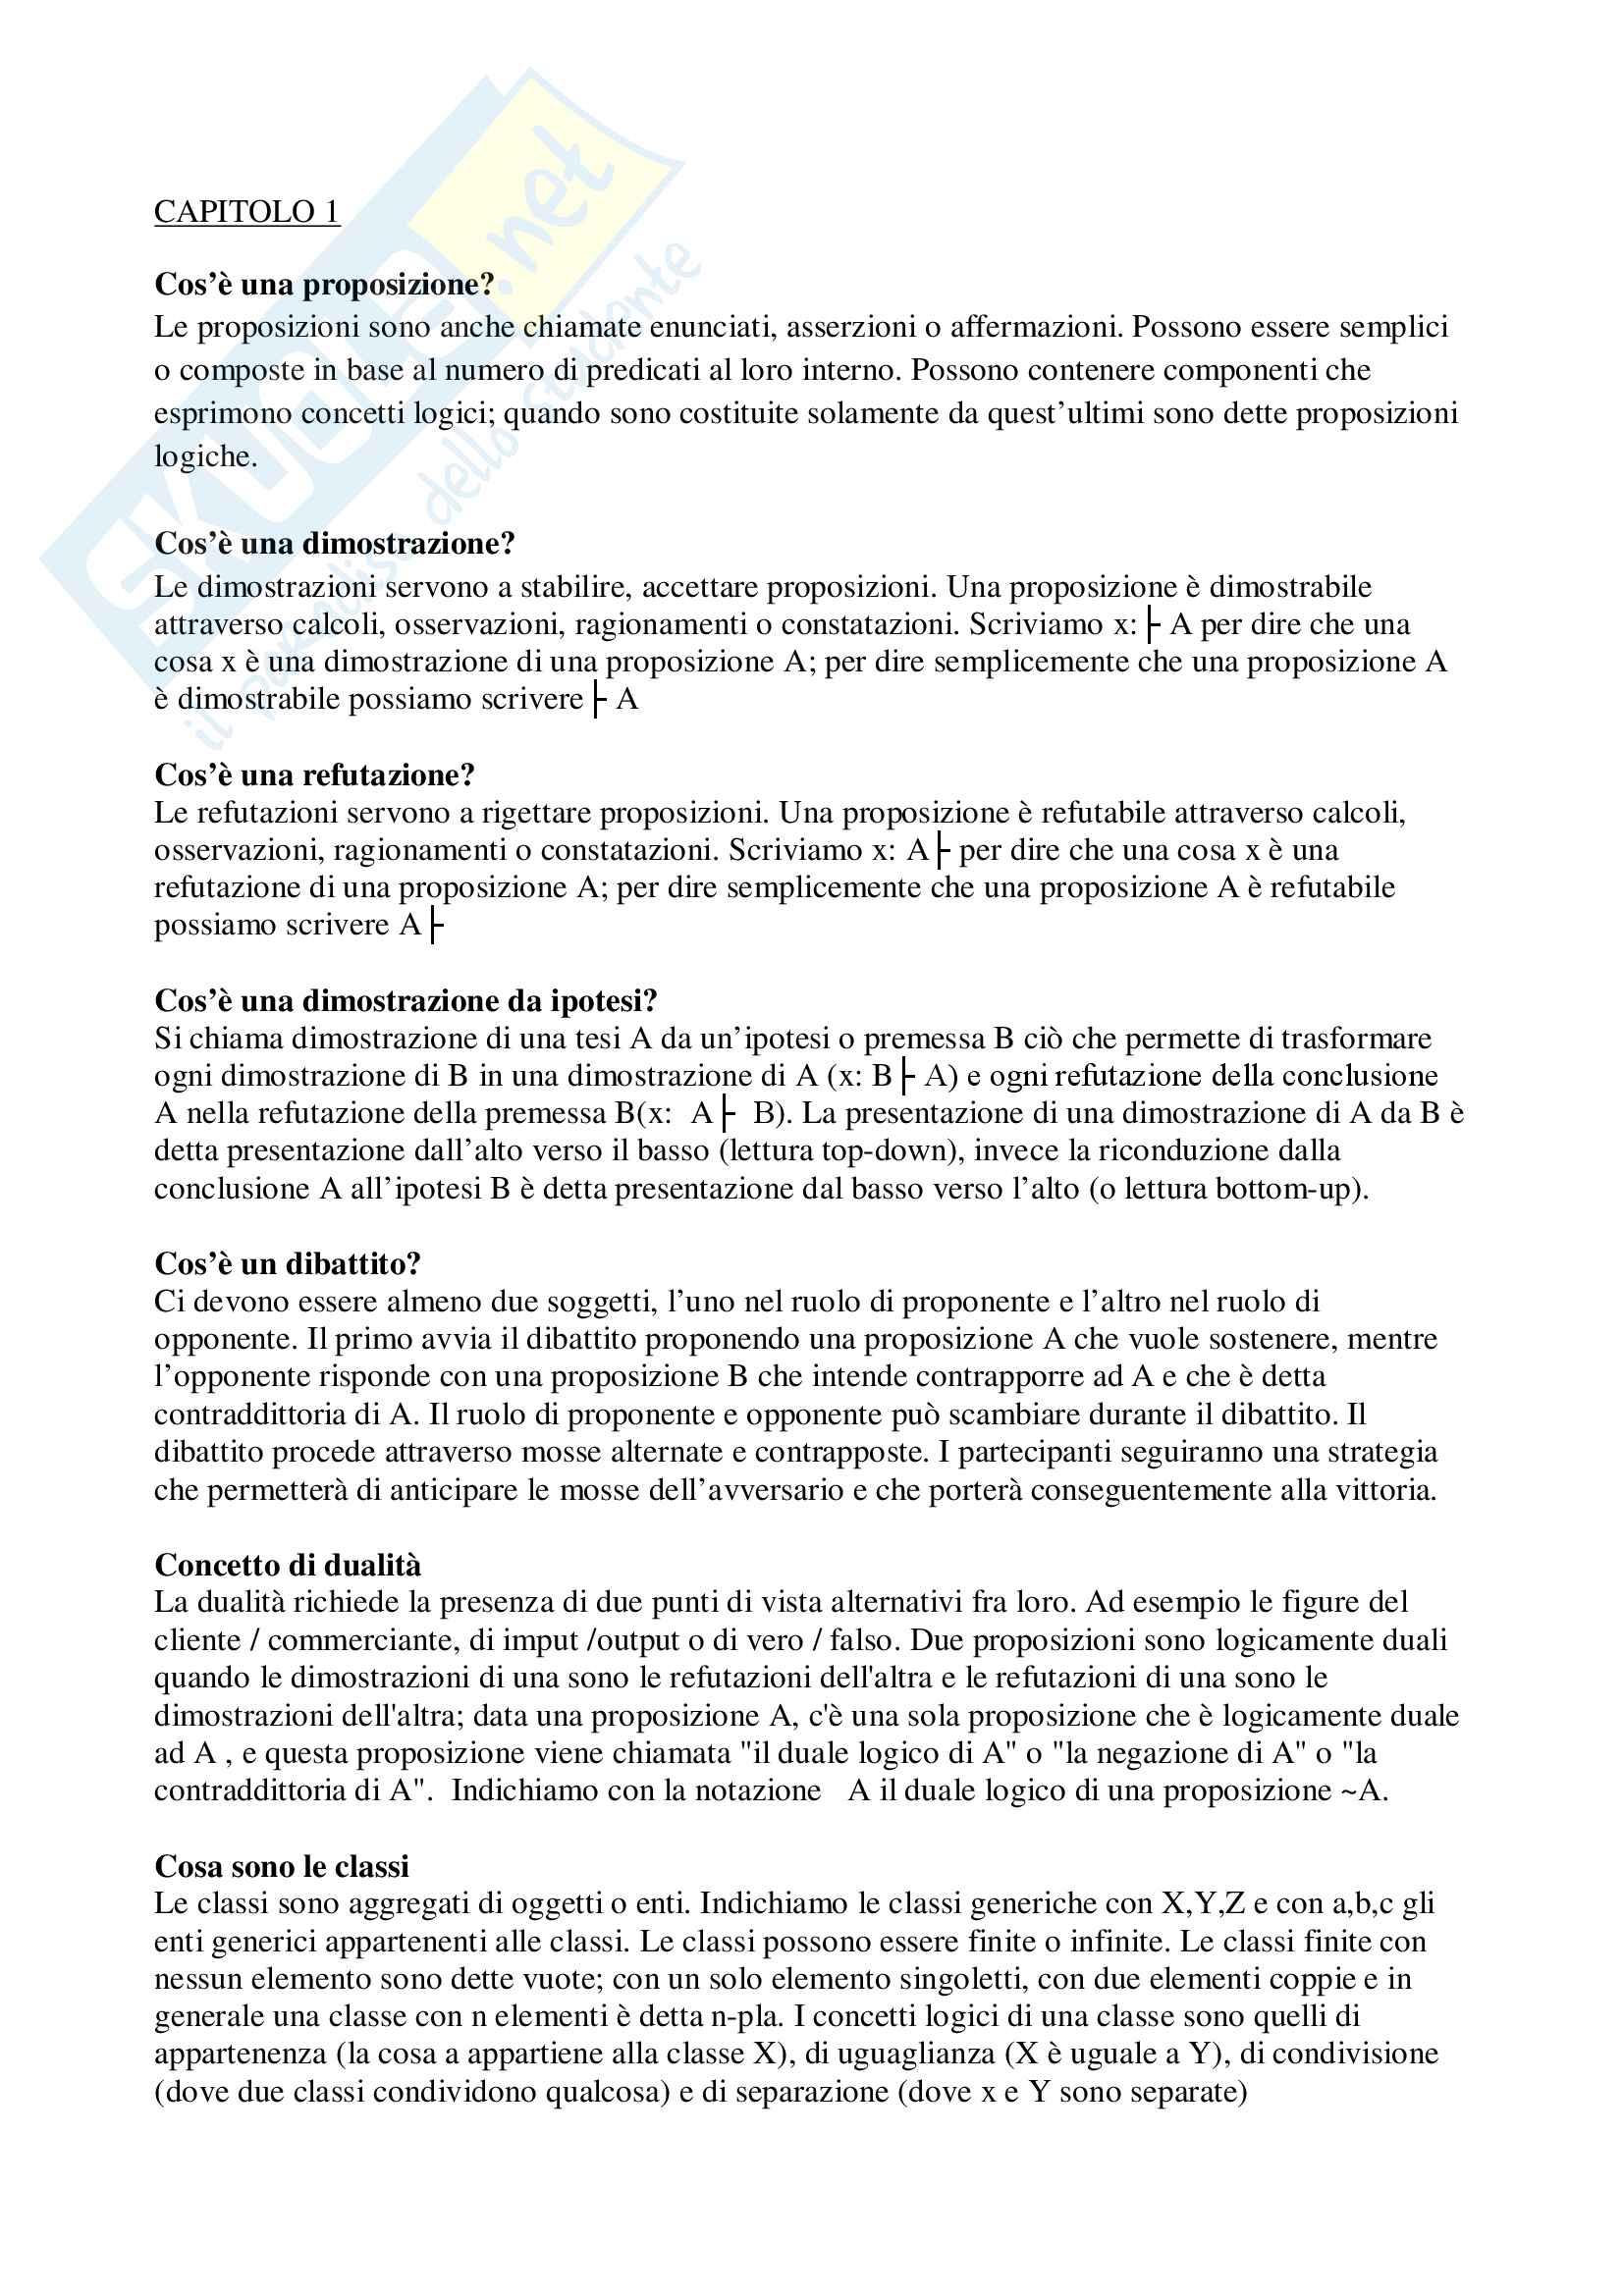 Riassunti per esame di logica + esercizi, prof. Abrusci, Università Roma tre,